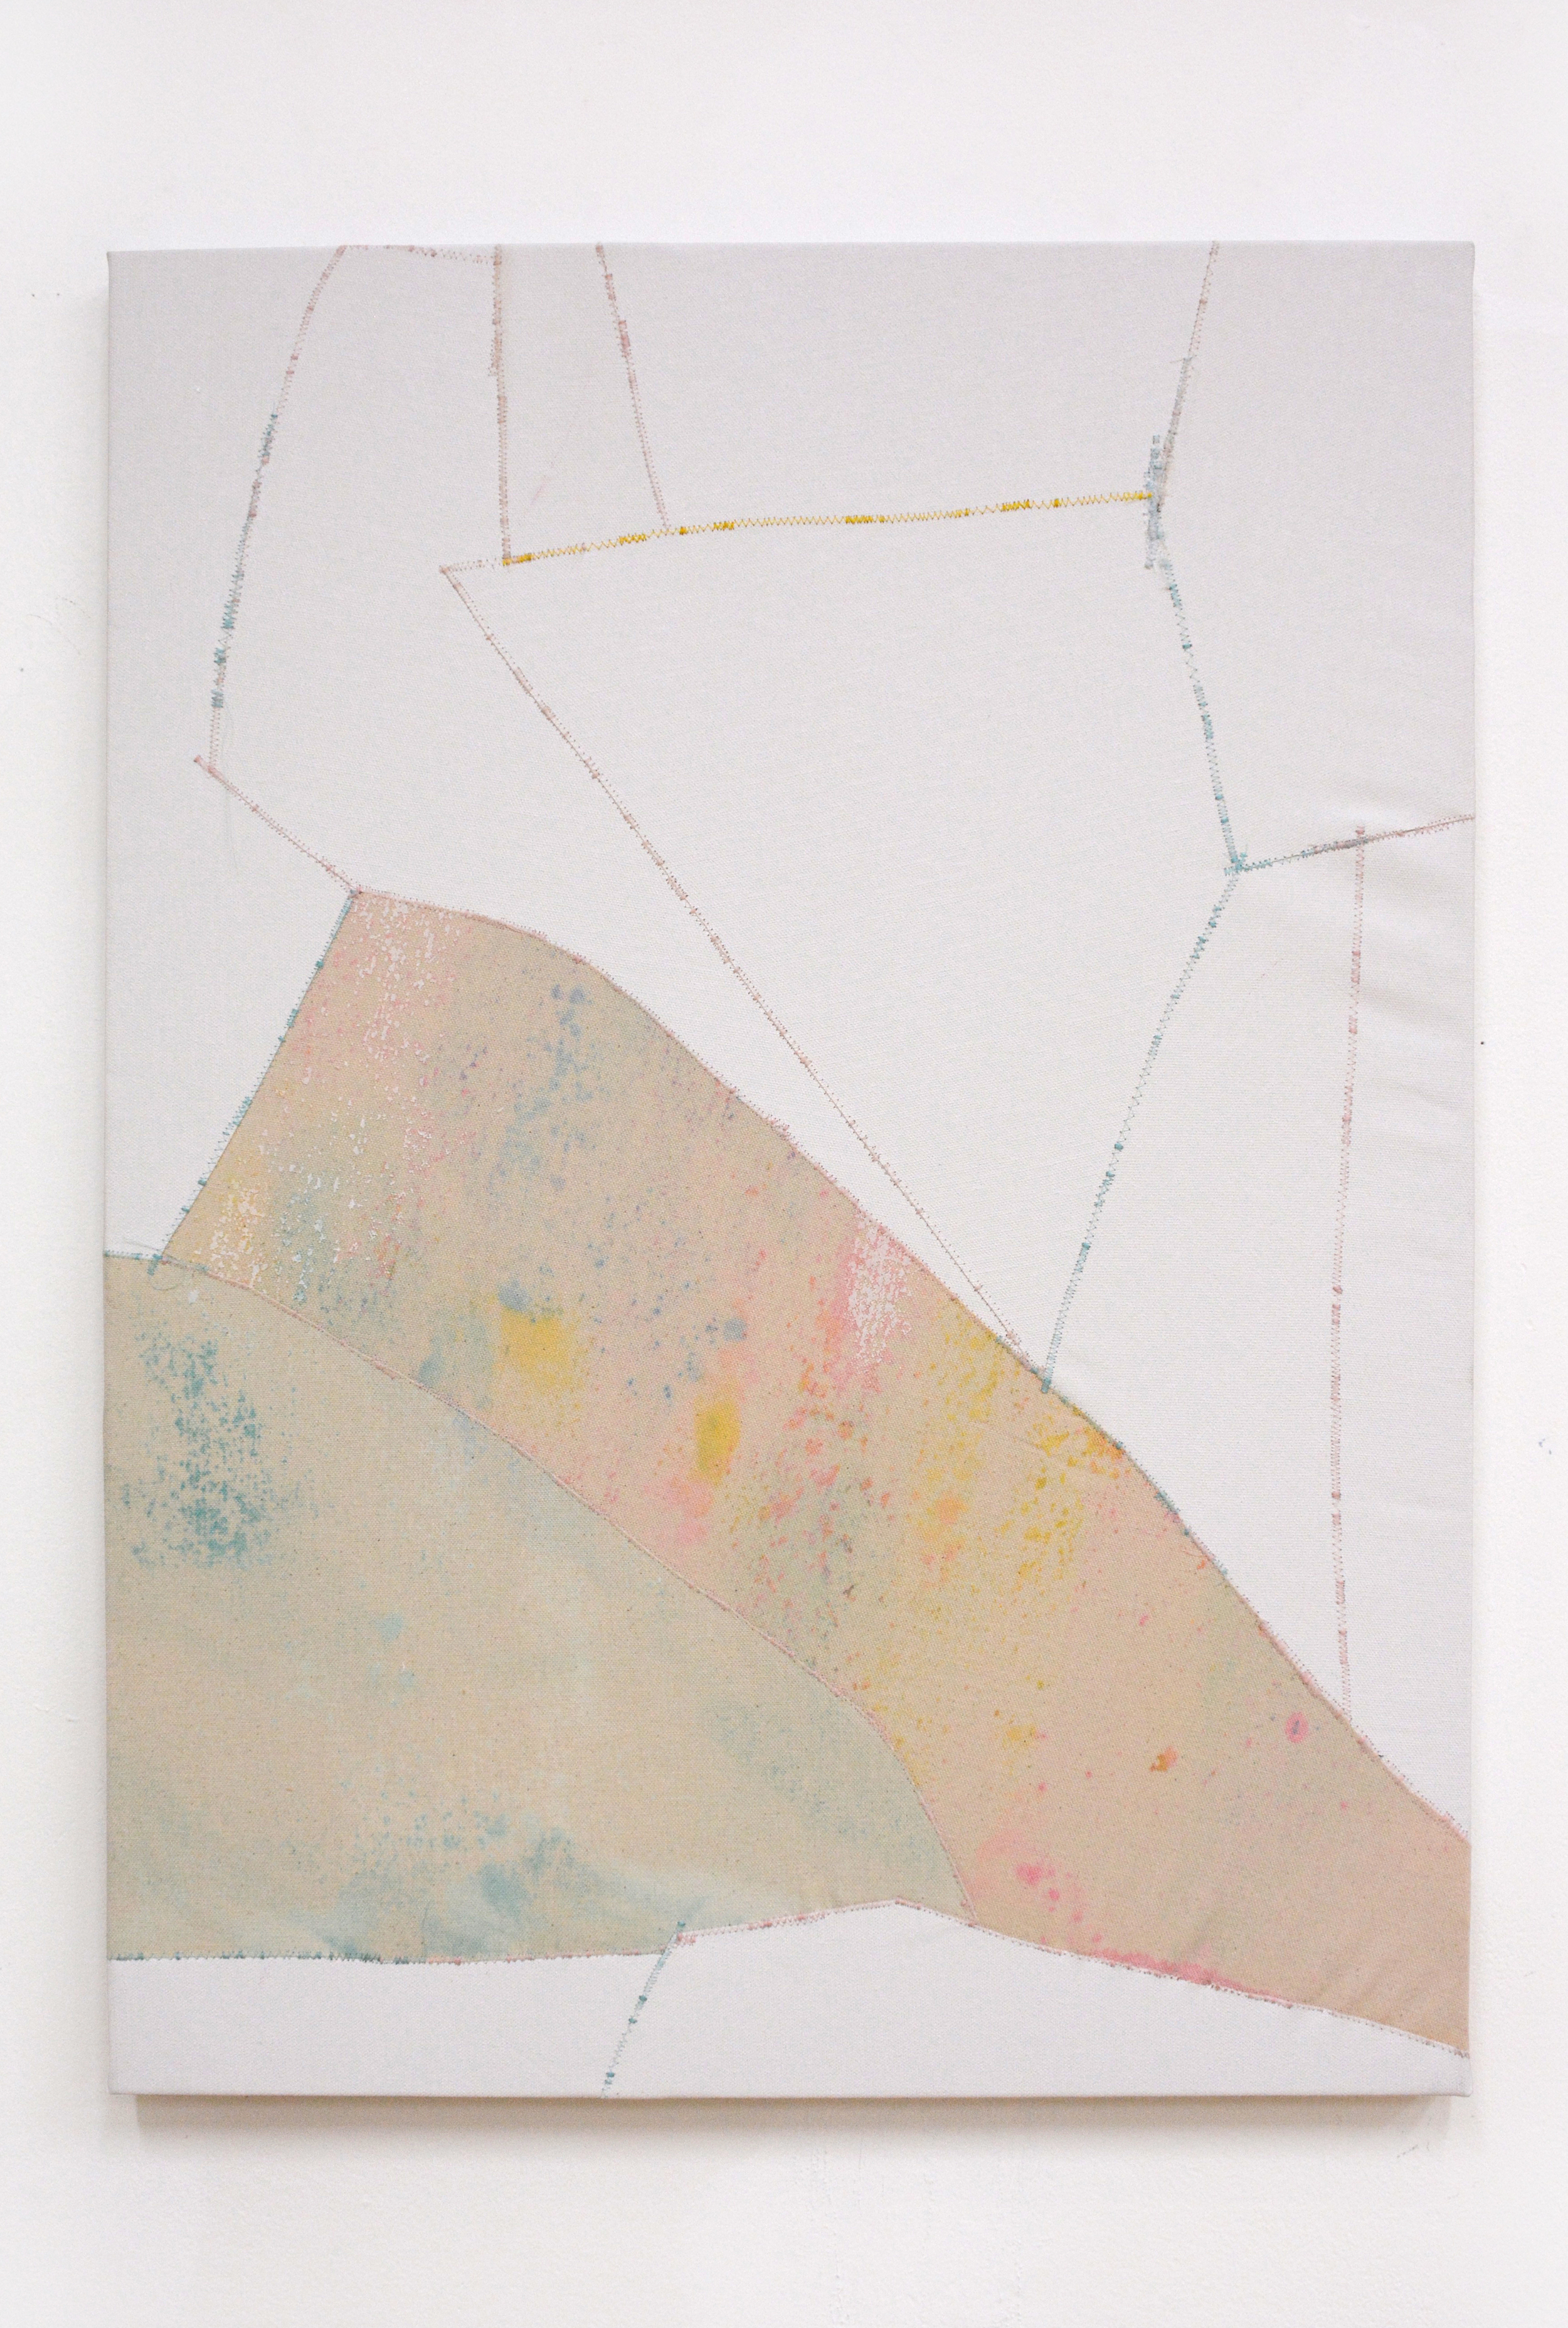 Bee , oil and thread on canvas, 56 x 76 cm, 2016  .